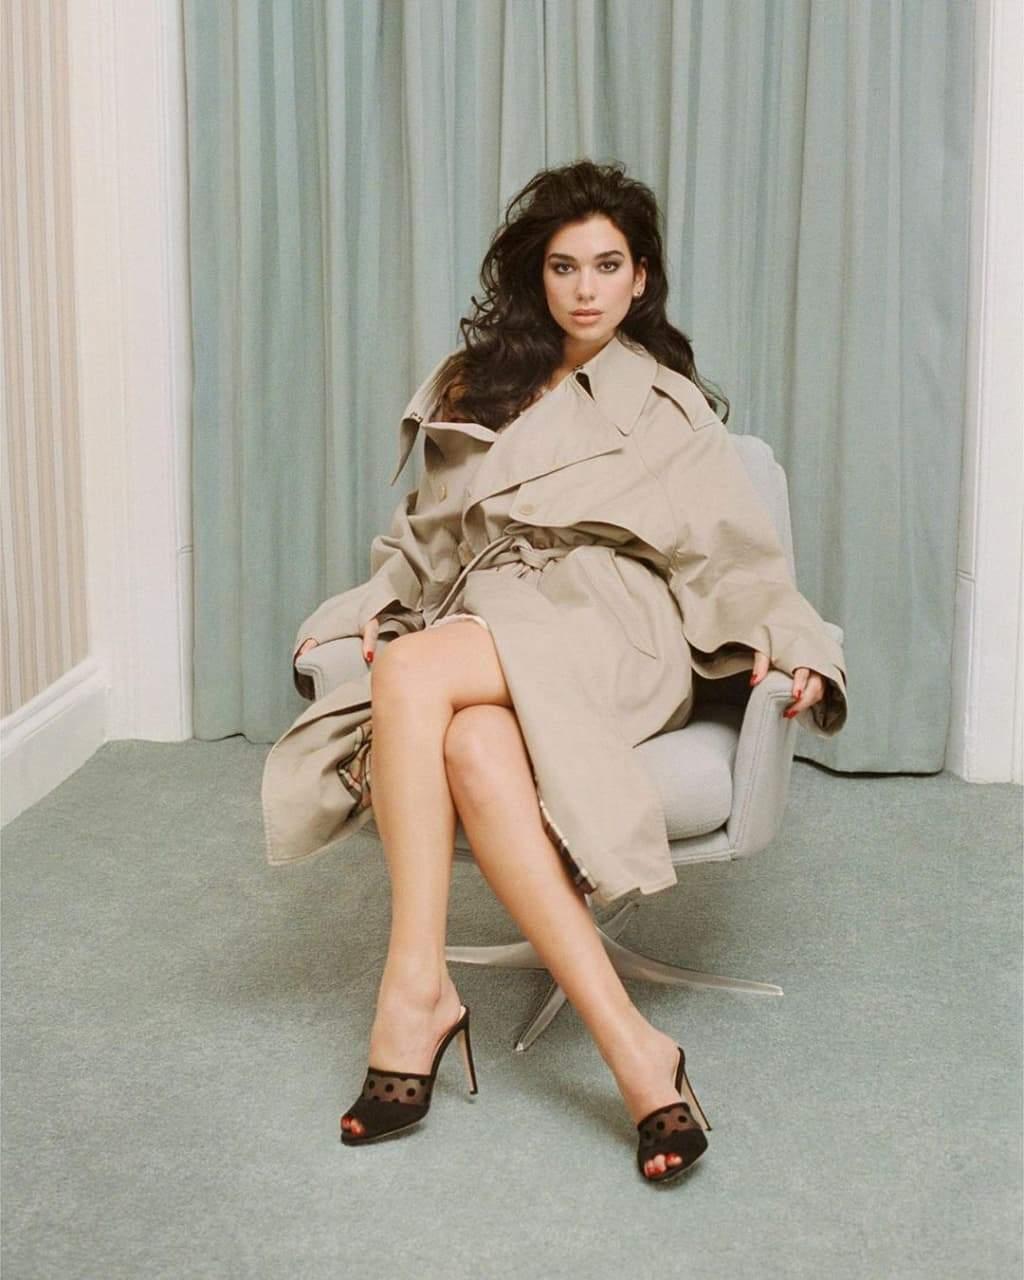 Дуа Ліпа знялася у фотосесії для глянцю Vanity Fair